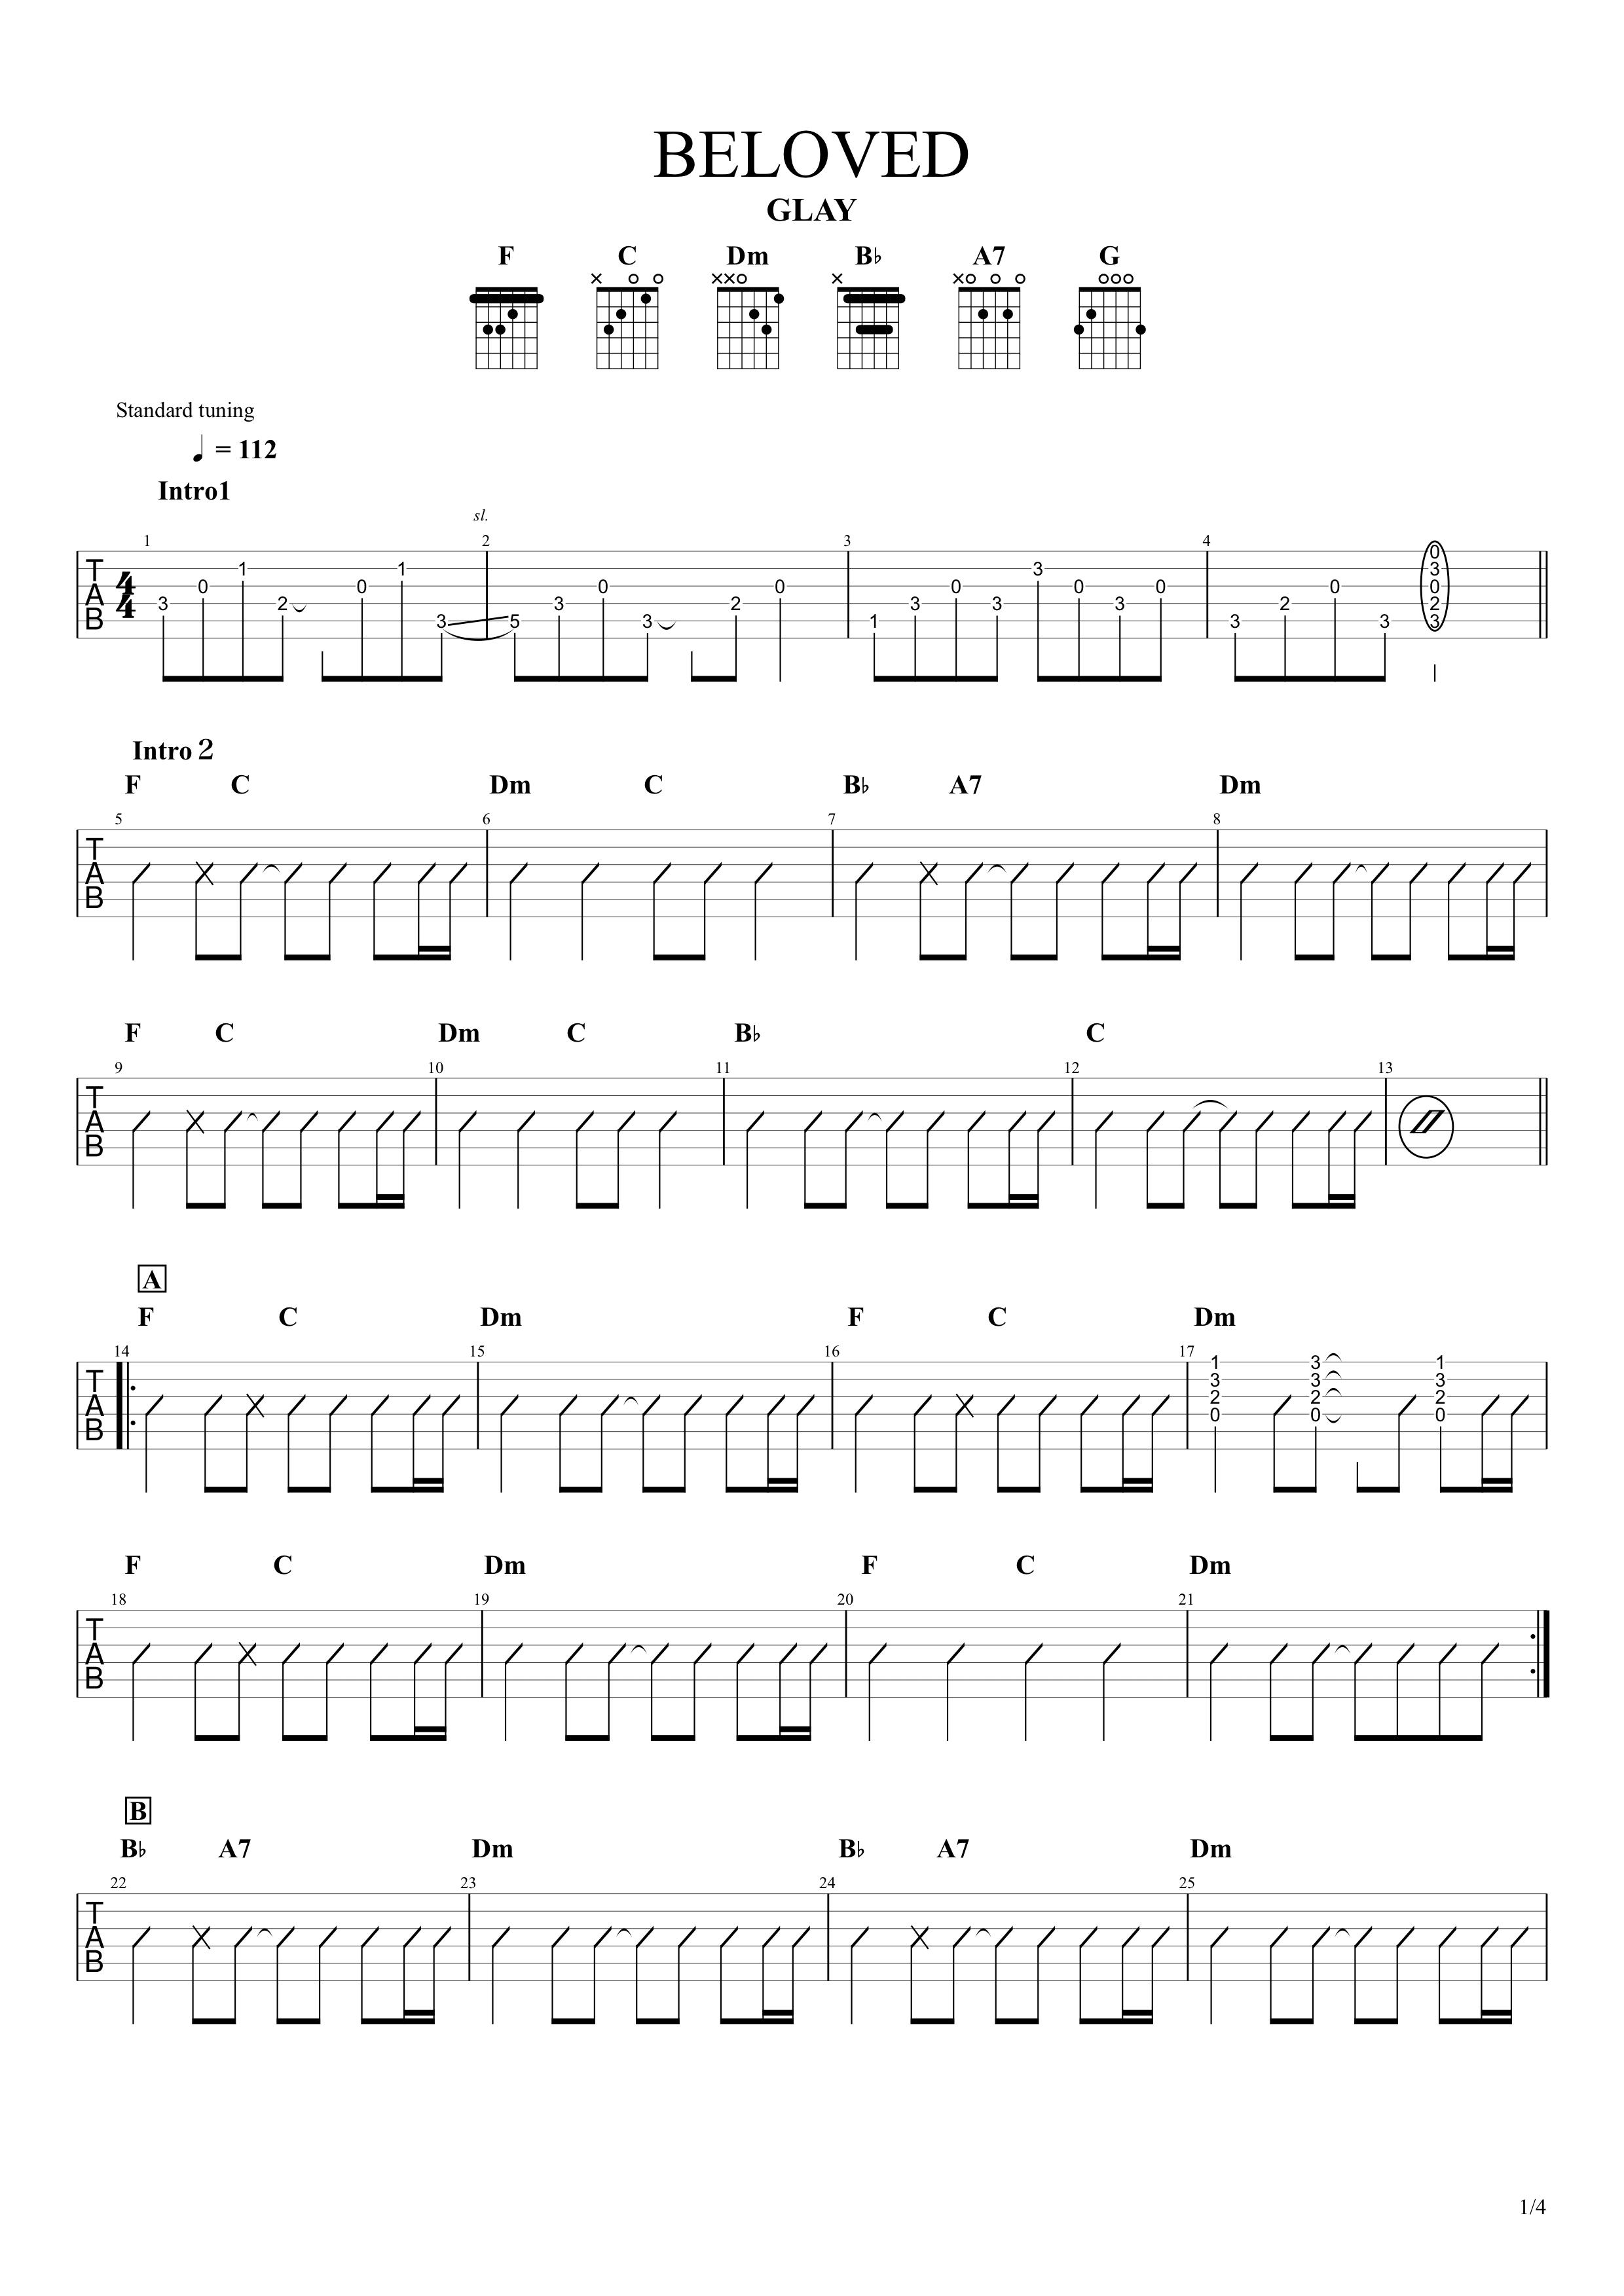 BELOVED/GLAY ギターコード&タブ譜01